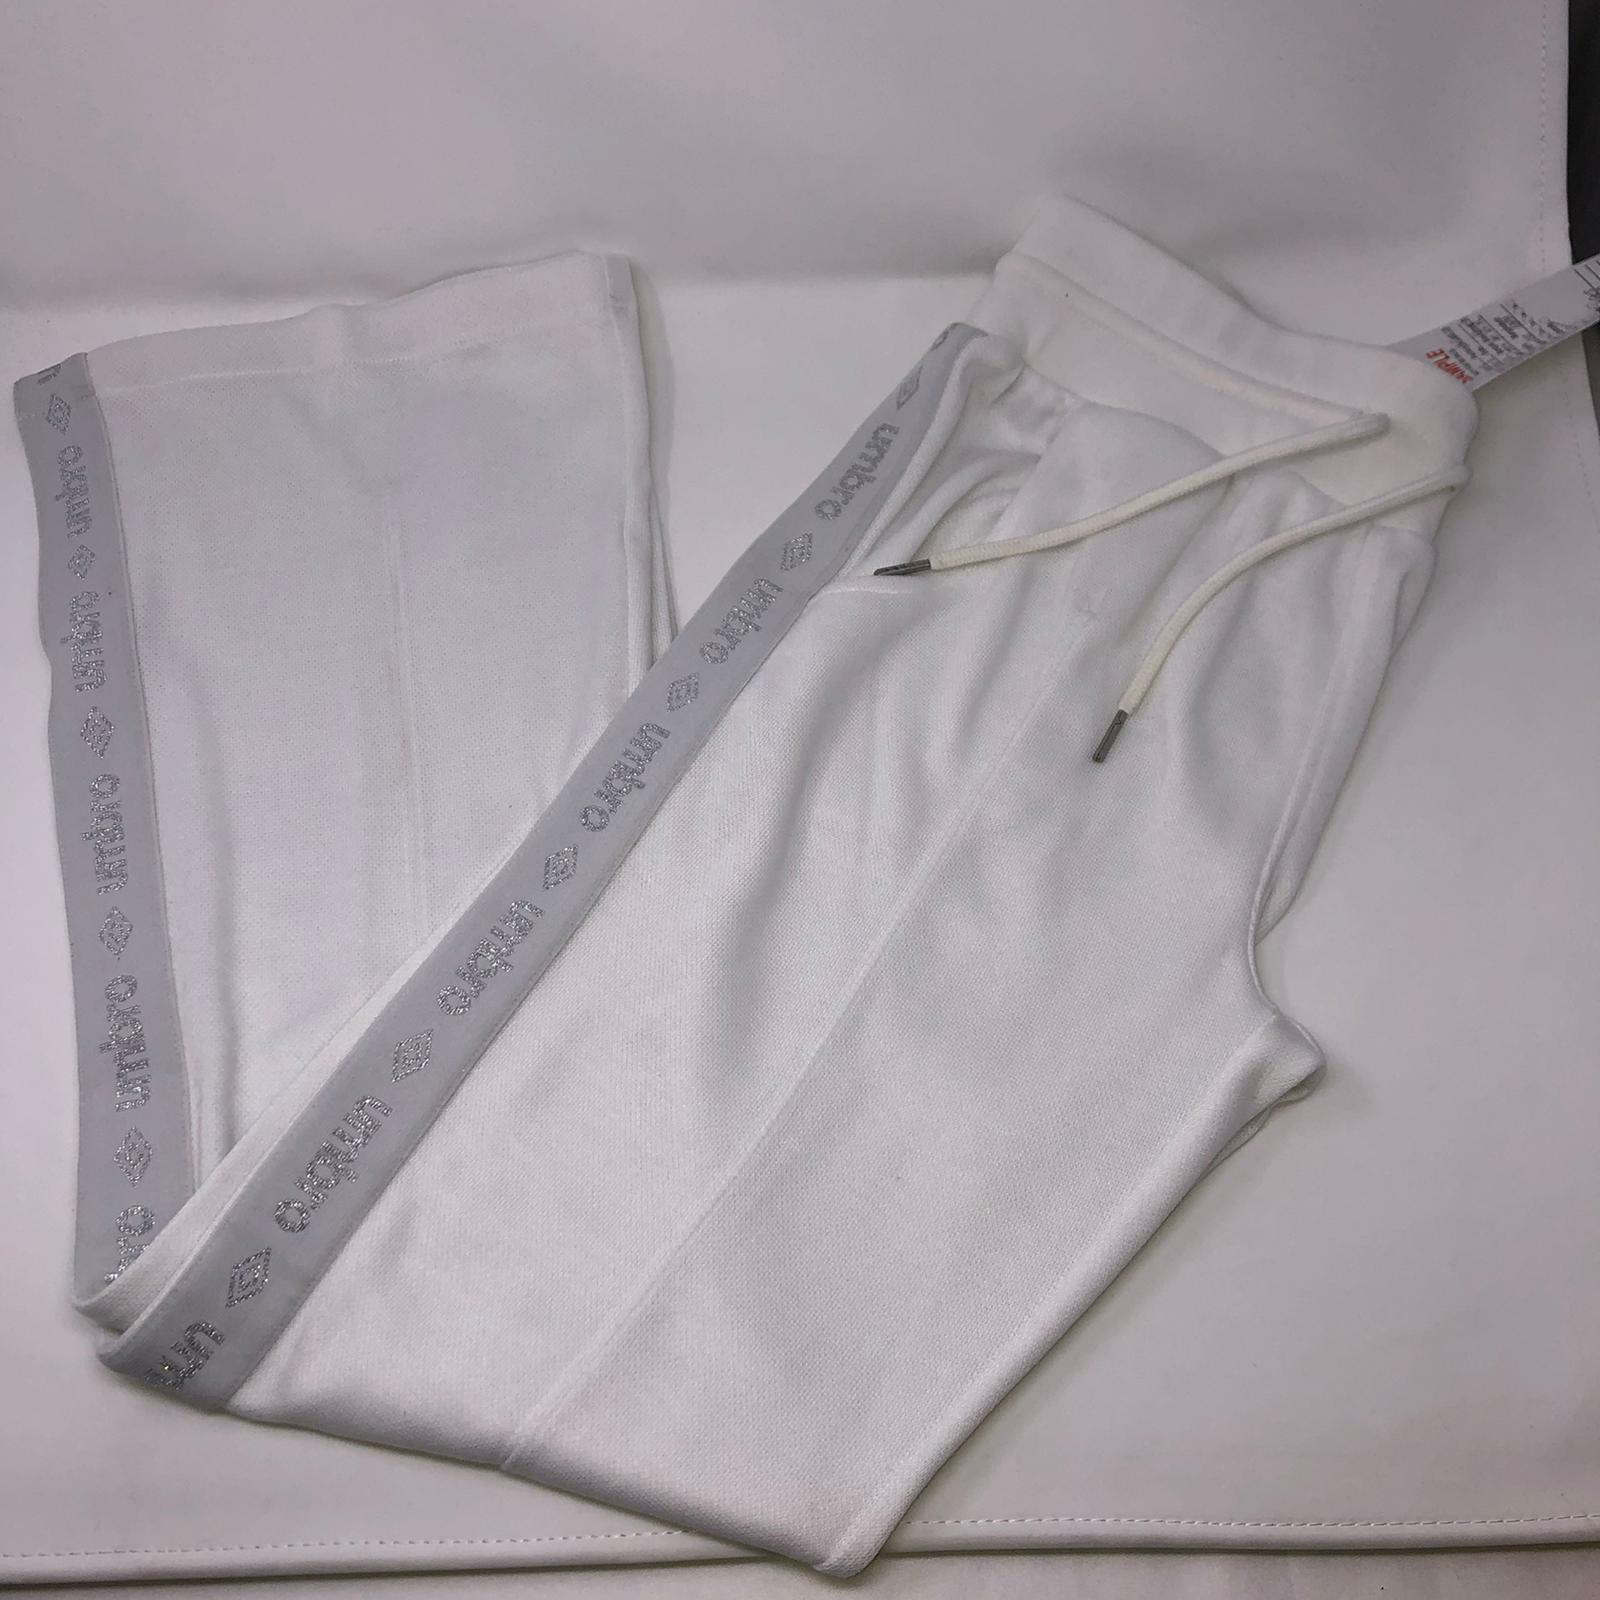 New Umbro White Sports Warmup Training Pants Women Medium